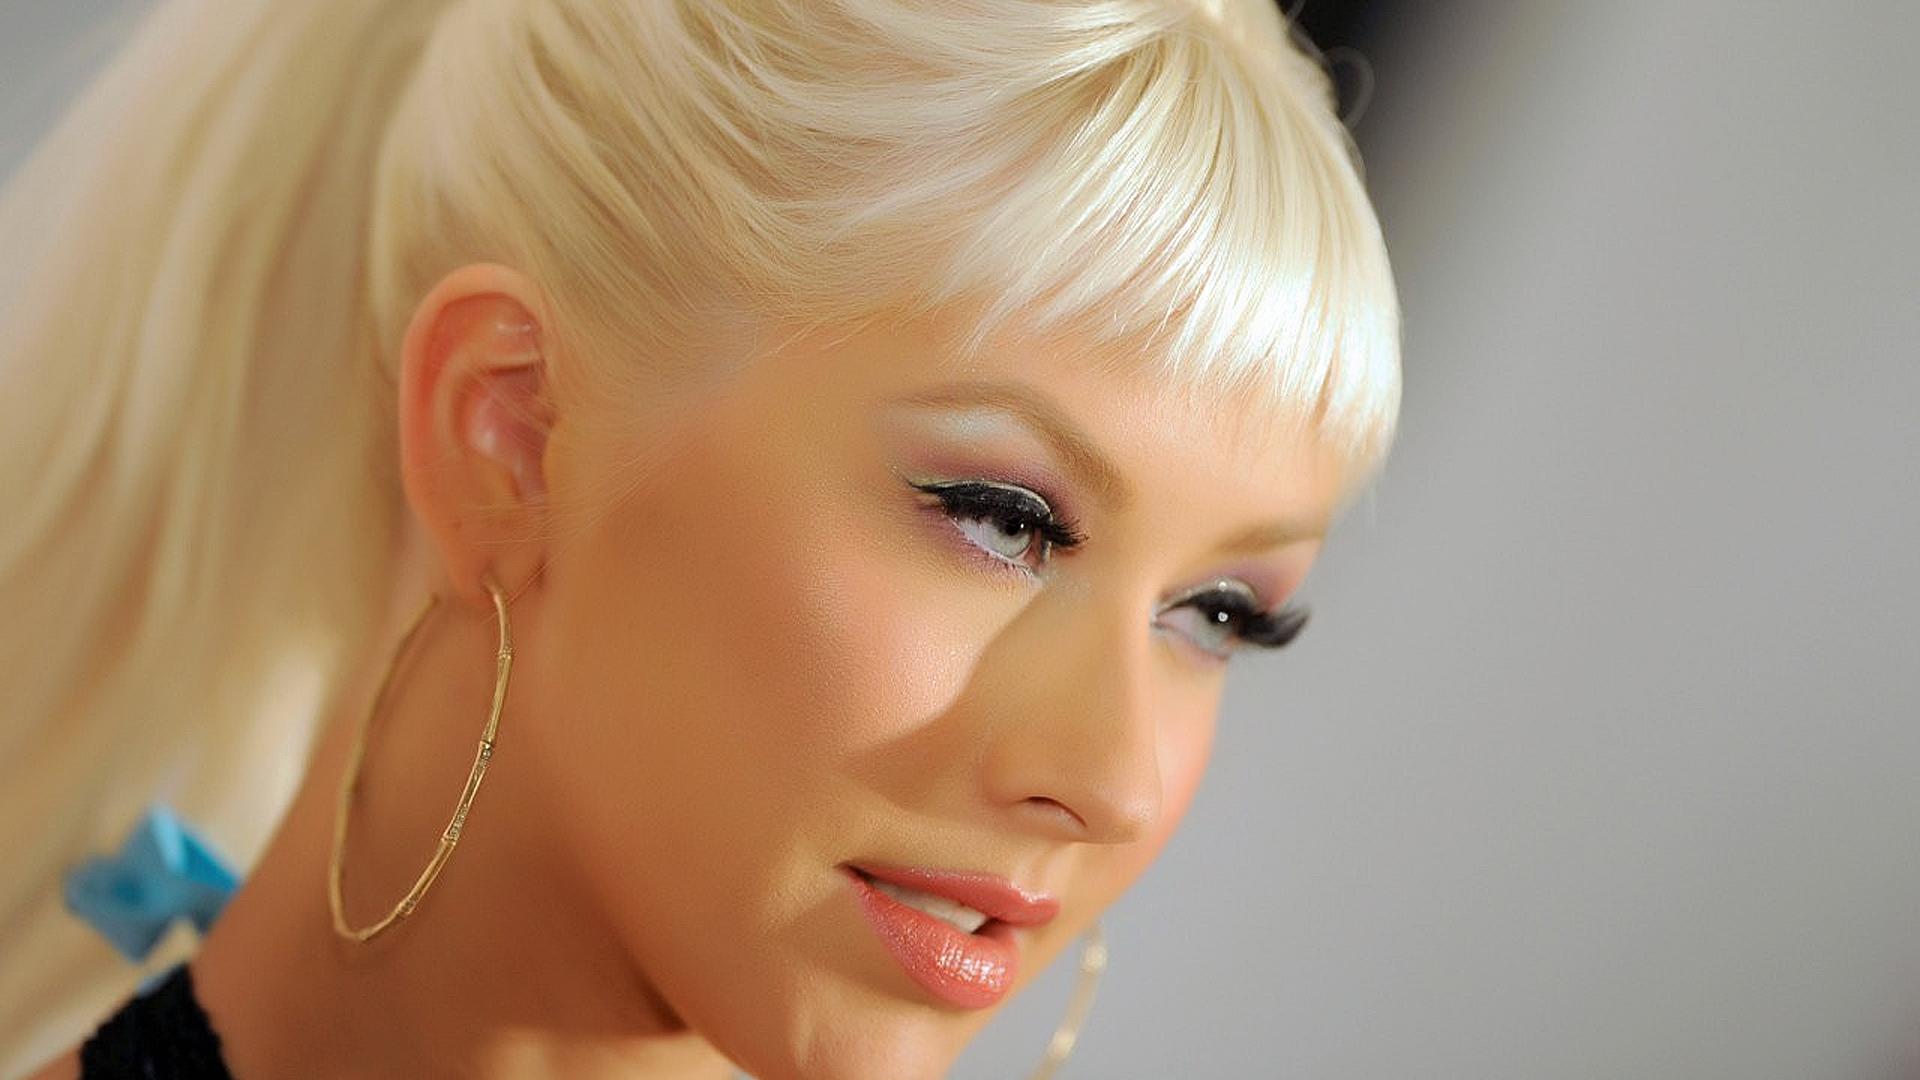 Christina Aguilera Hd Wallpaper Background Image 1920x1080 Id